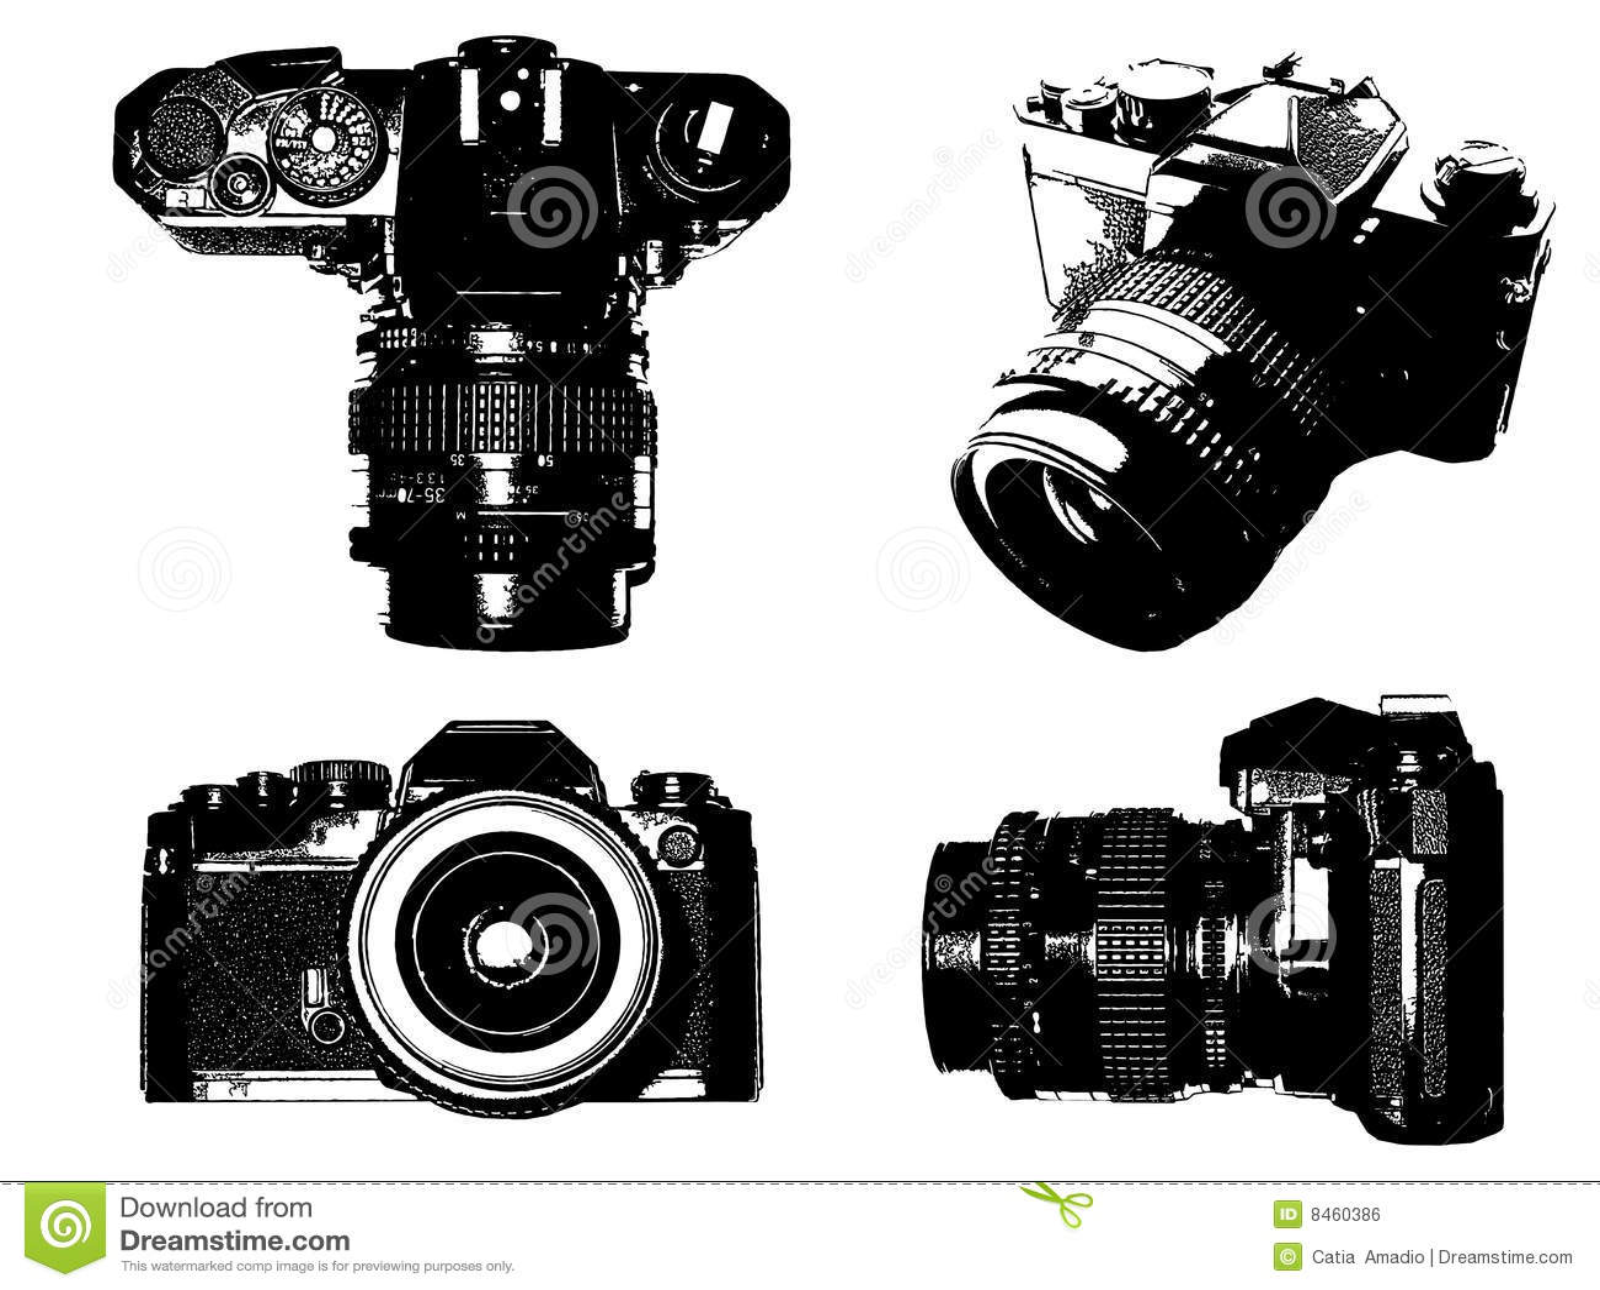 Slr Camera Royalty Free Stock Image - Image: 8460386